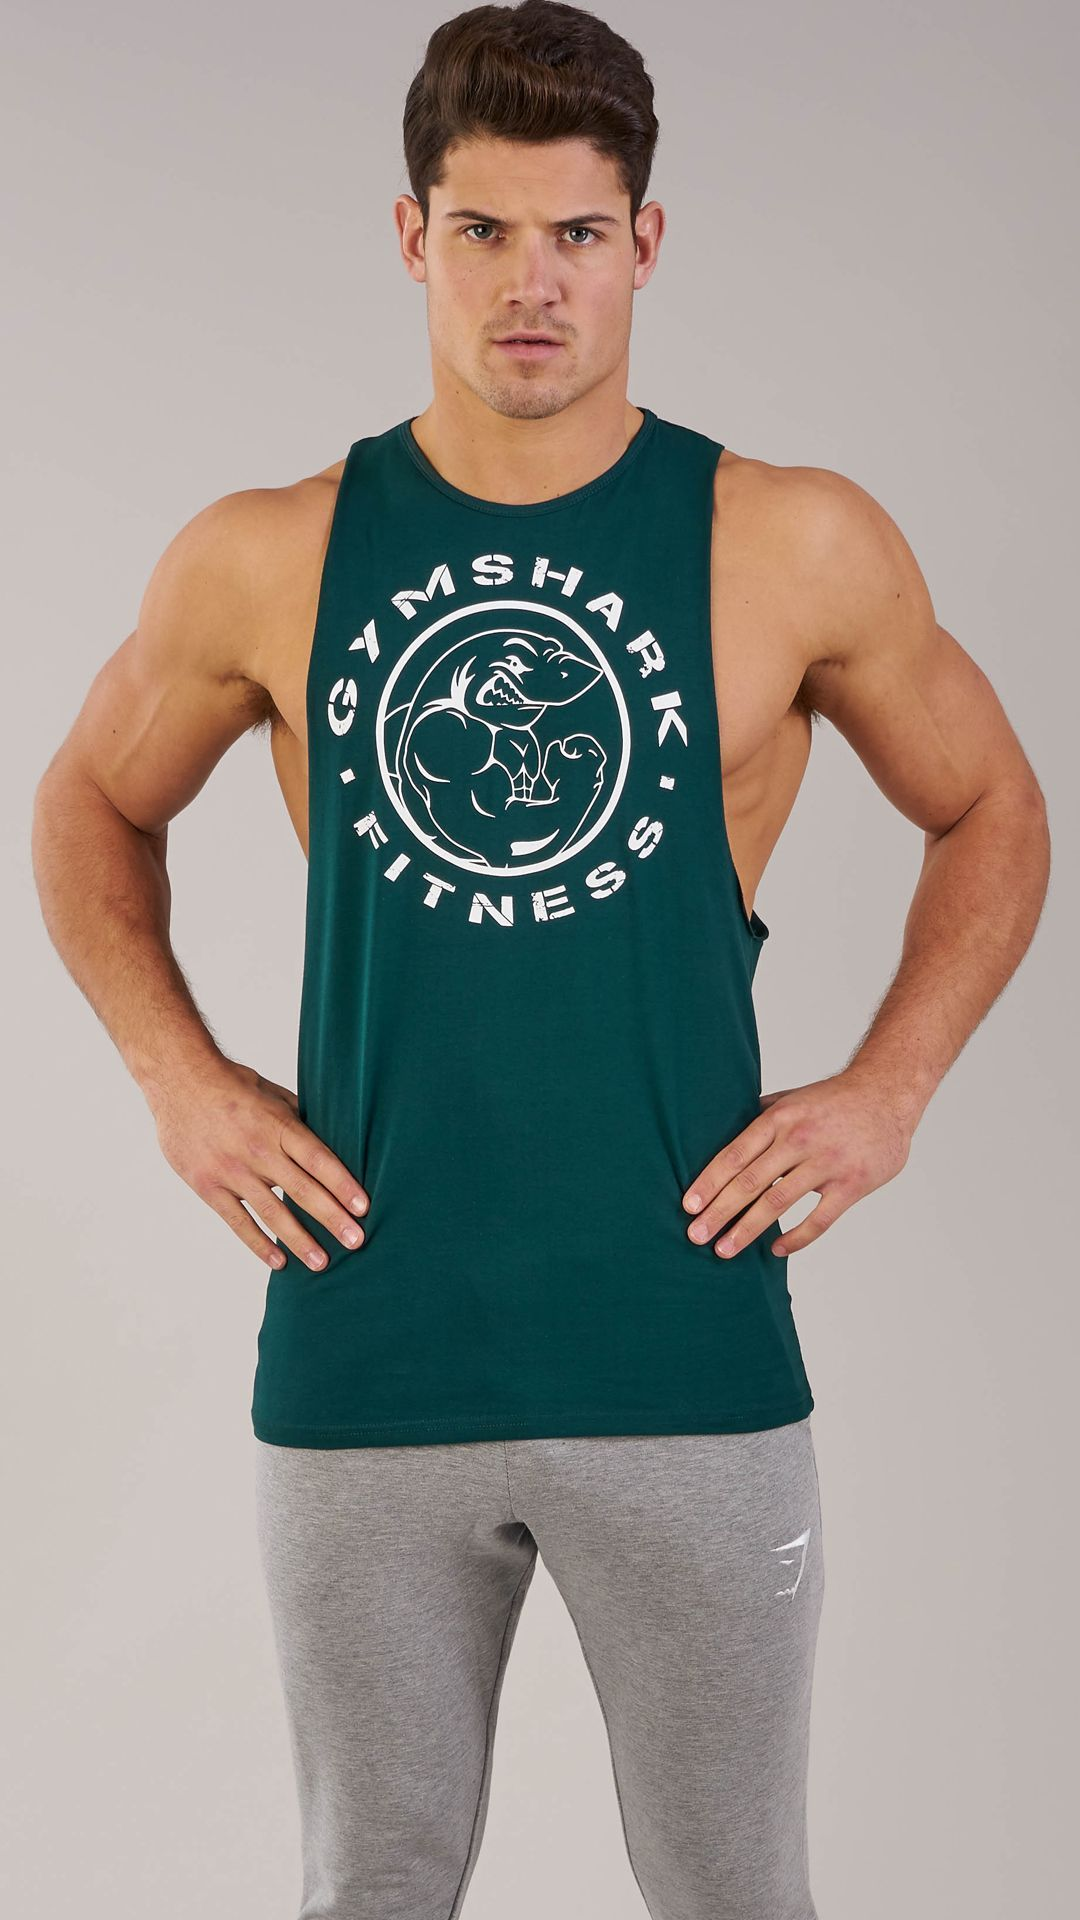 29a7504f26b479 Mens Bodybuilding Gym String Posing Tank Top New Gary Majdell Sport ...